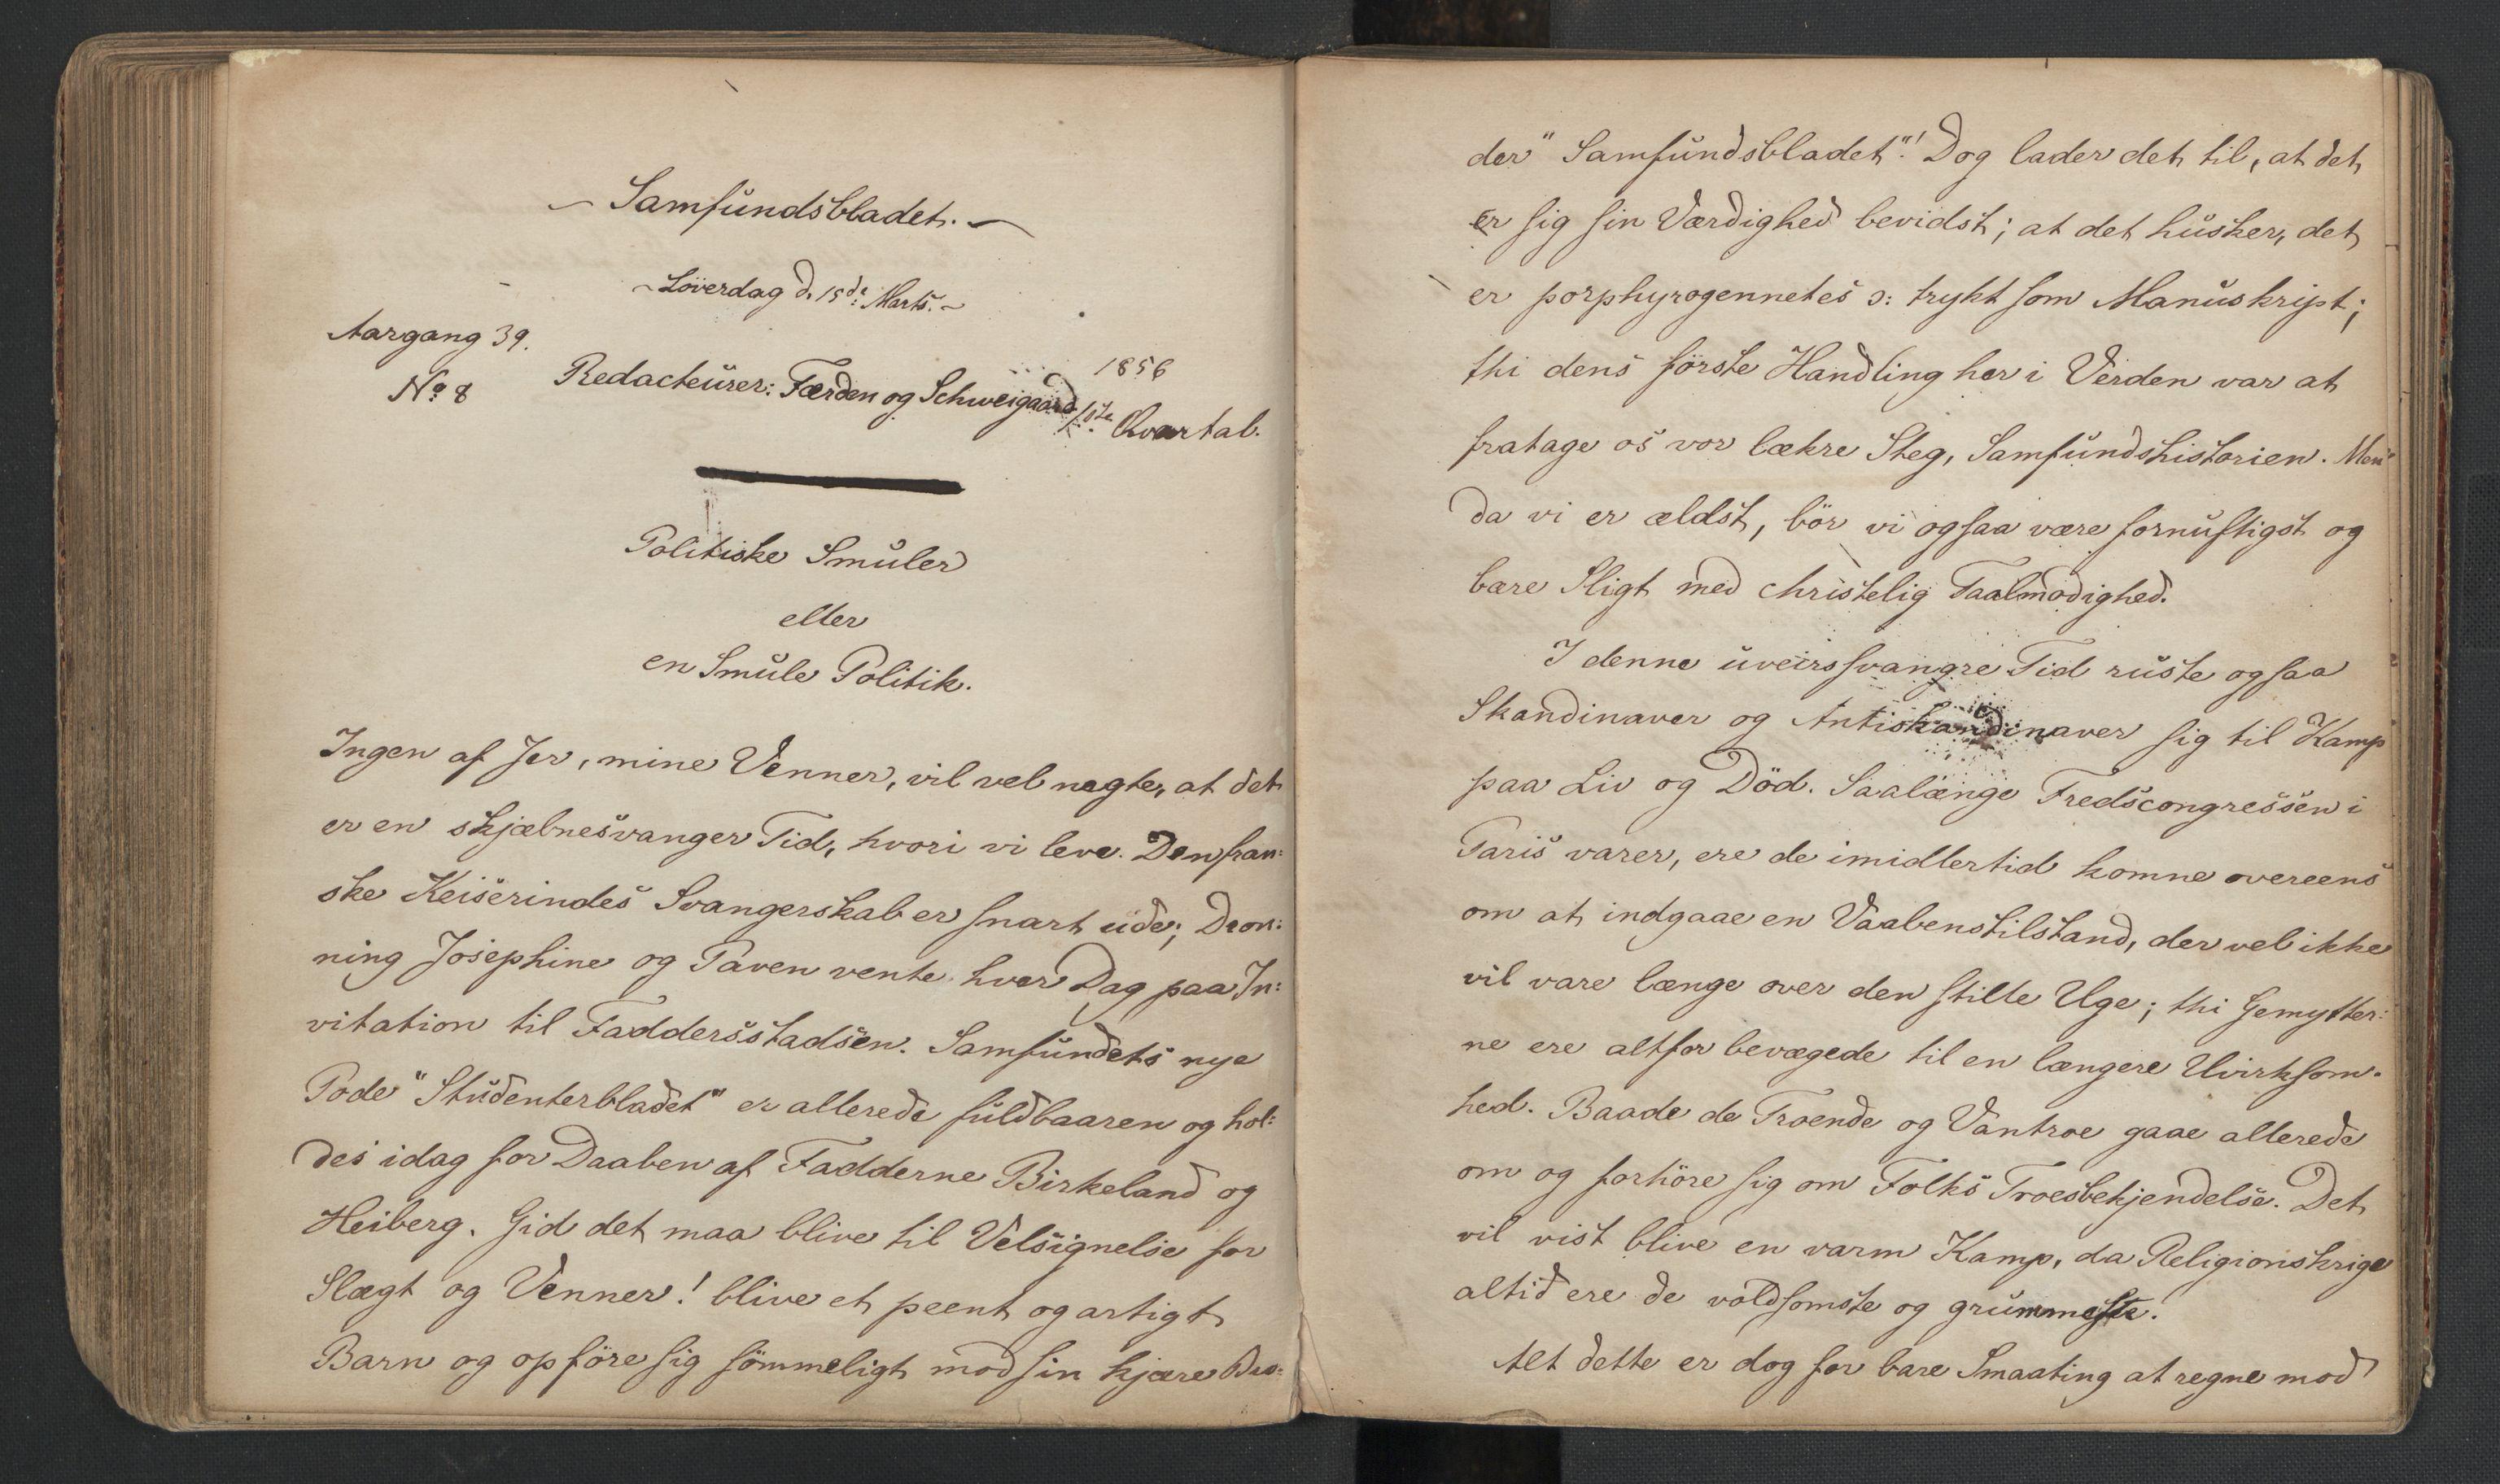 RA, Det Norske Studentersamfund, X/Xa/L0005, 1855-1856, s. 168